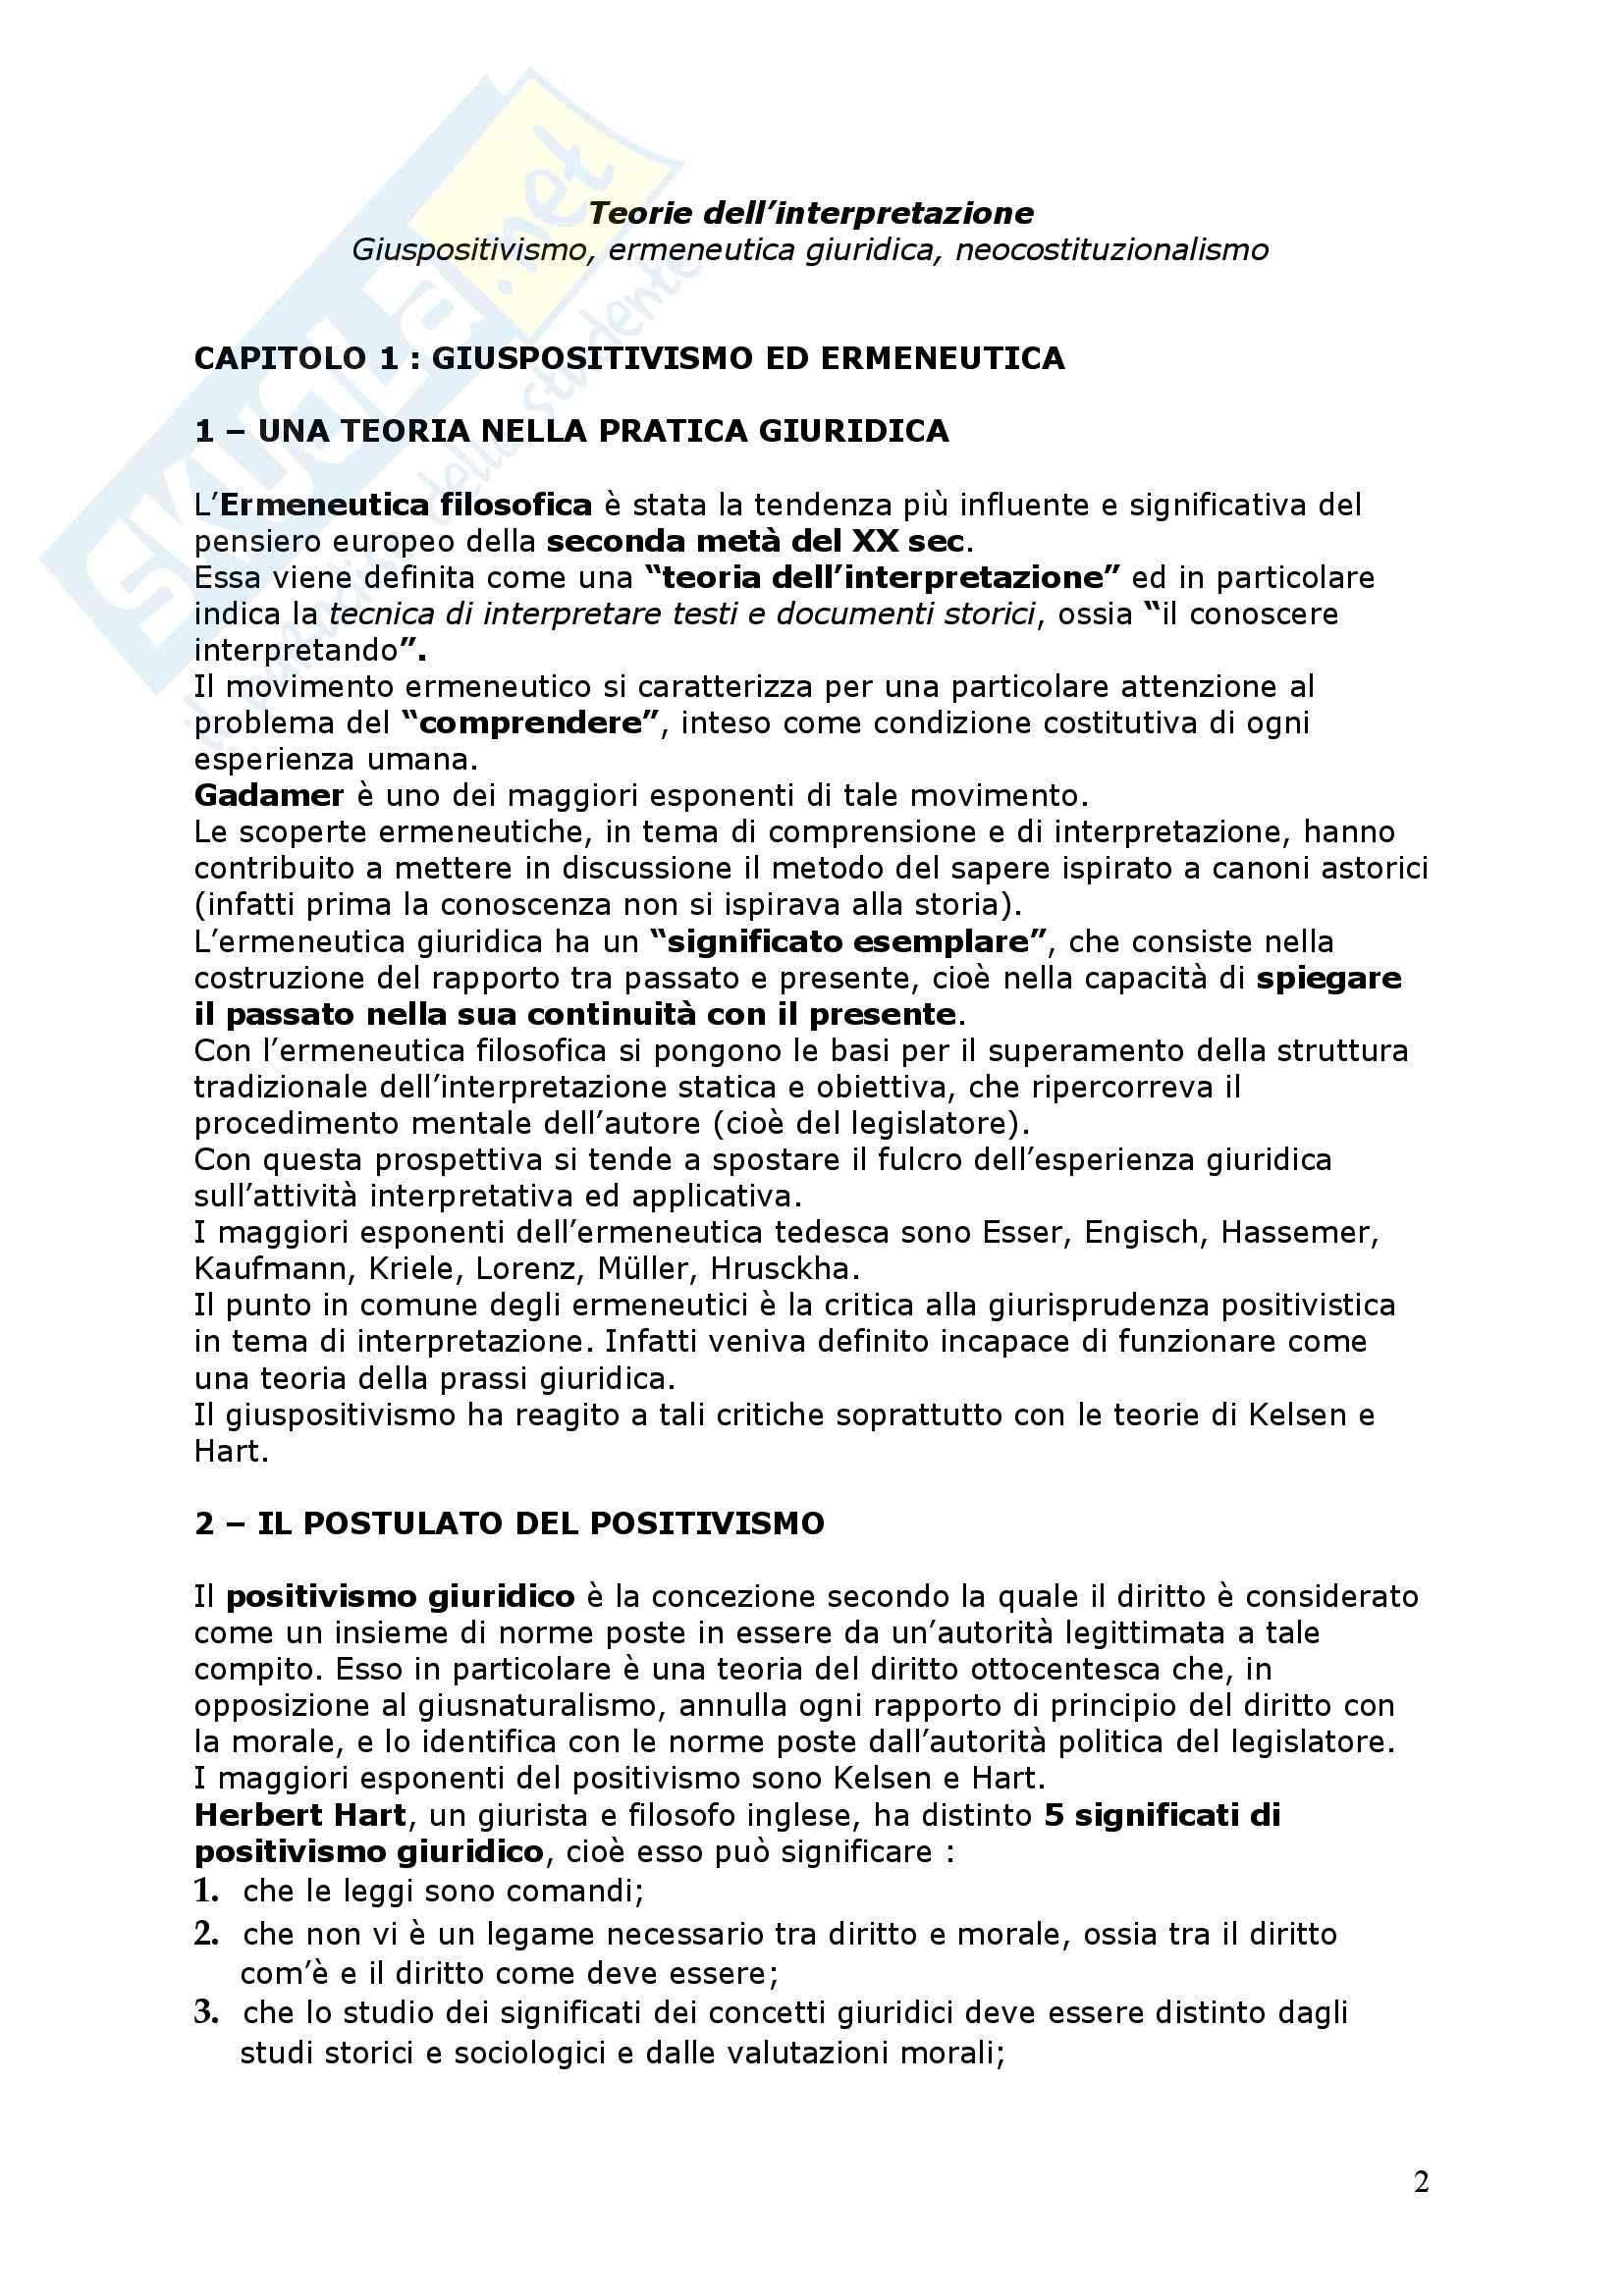 Positivismo giuridico ed ermeneutica filosofica Pag. 2